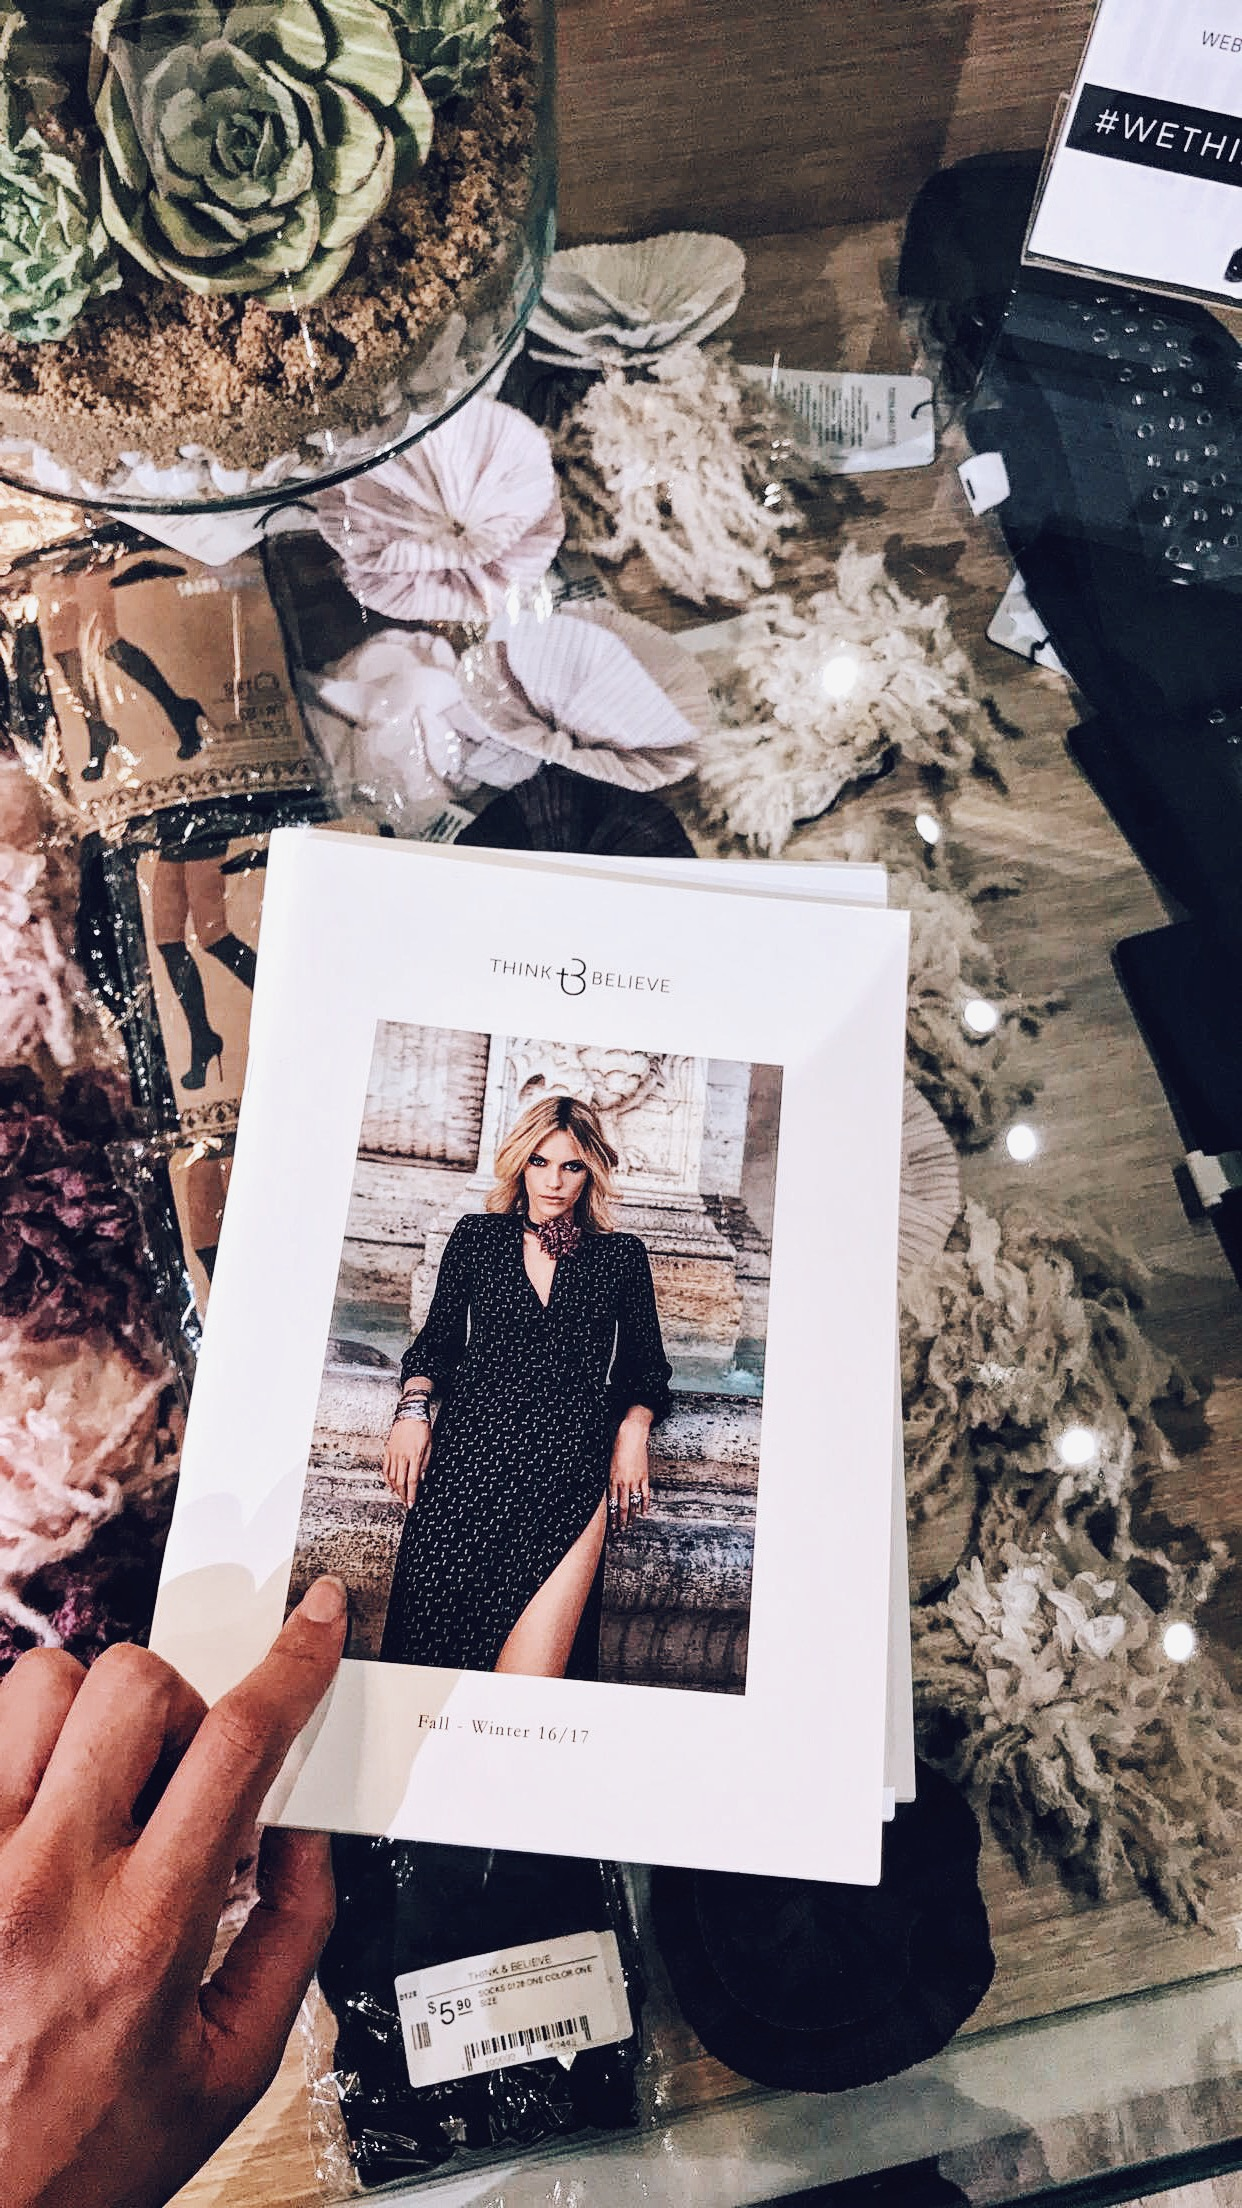 think-and-believe-miami-fashion-stylist-portfolio-blogger-illy-perez-house-of-she